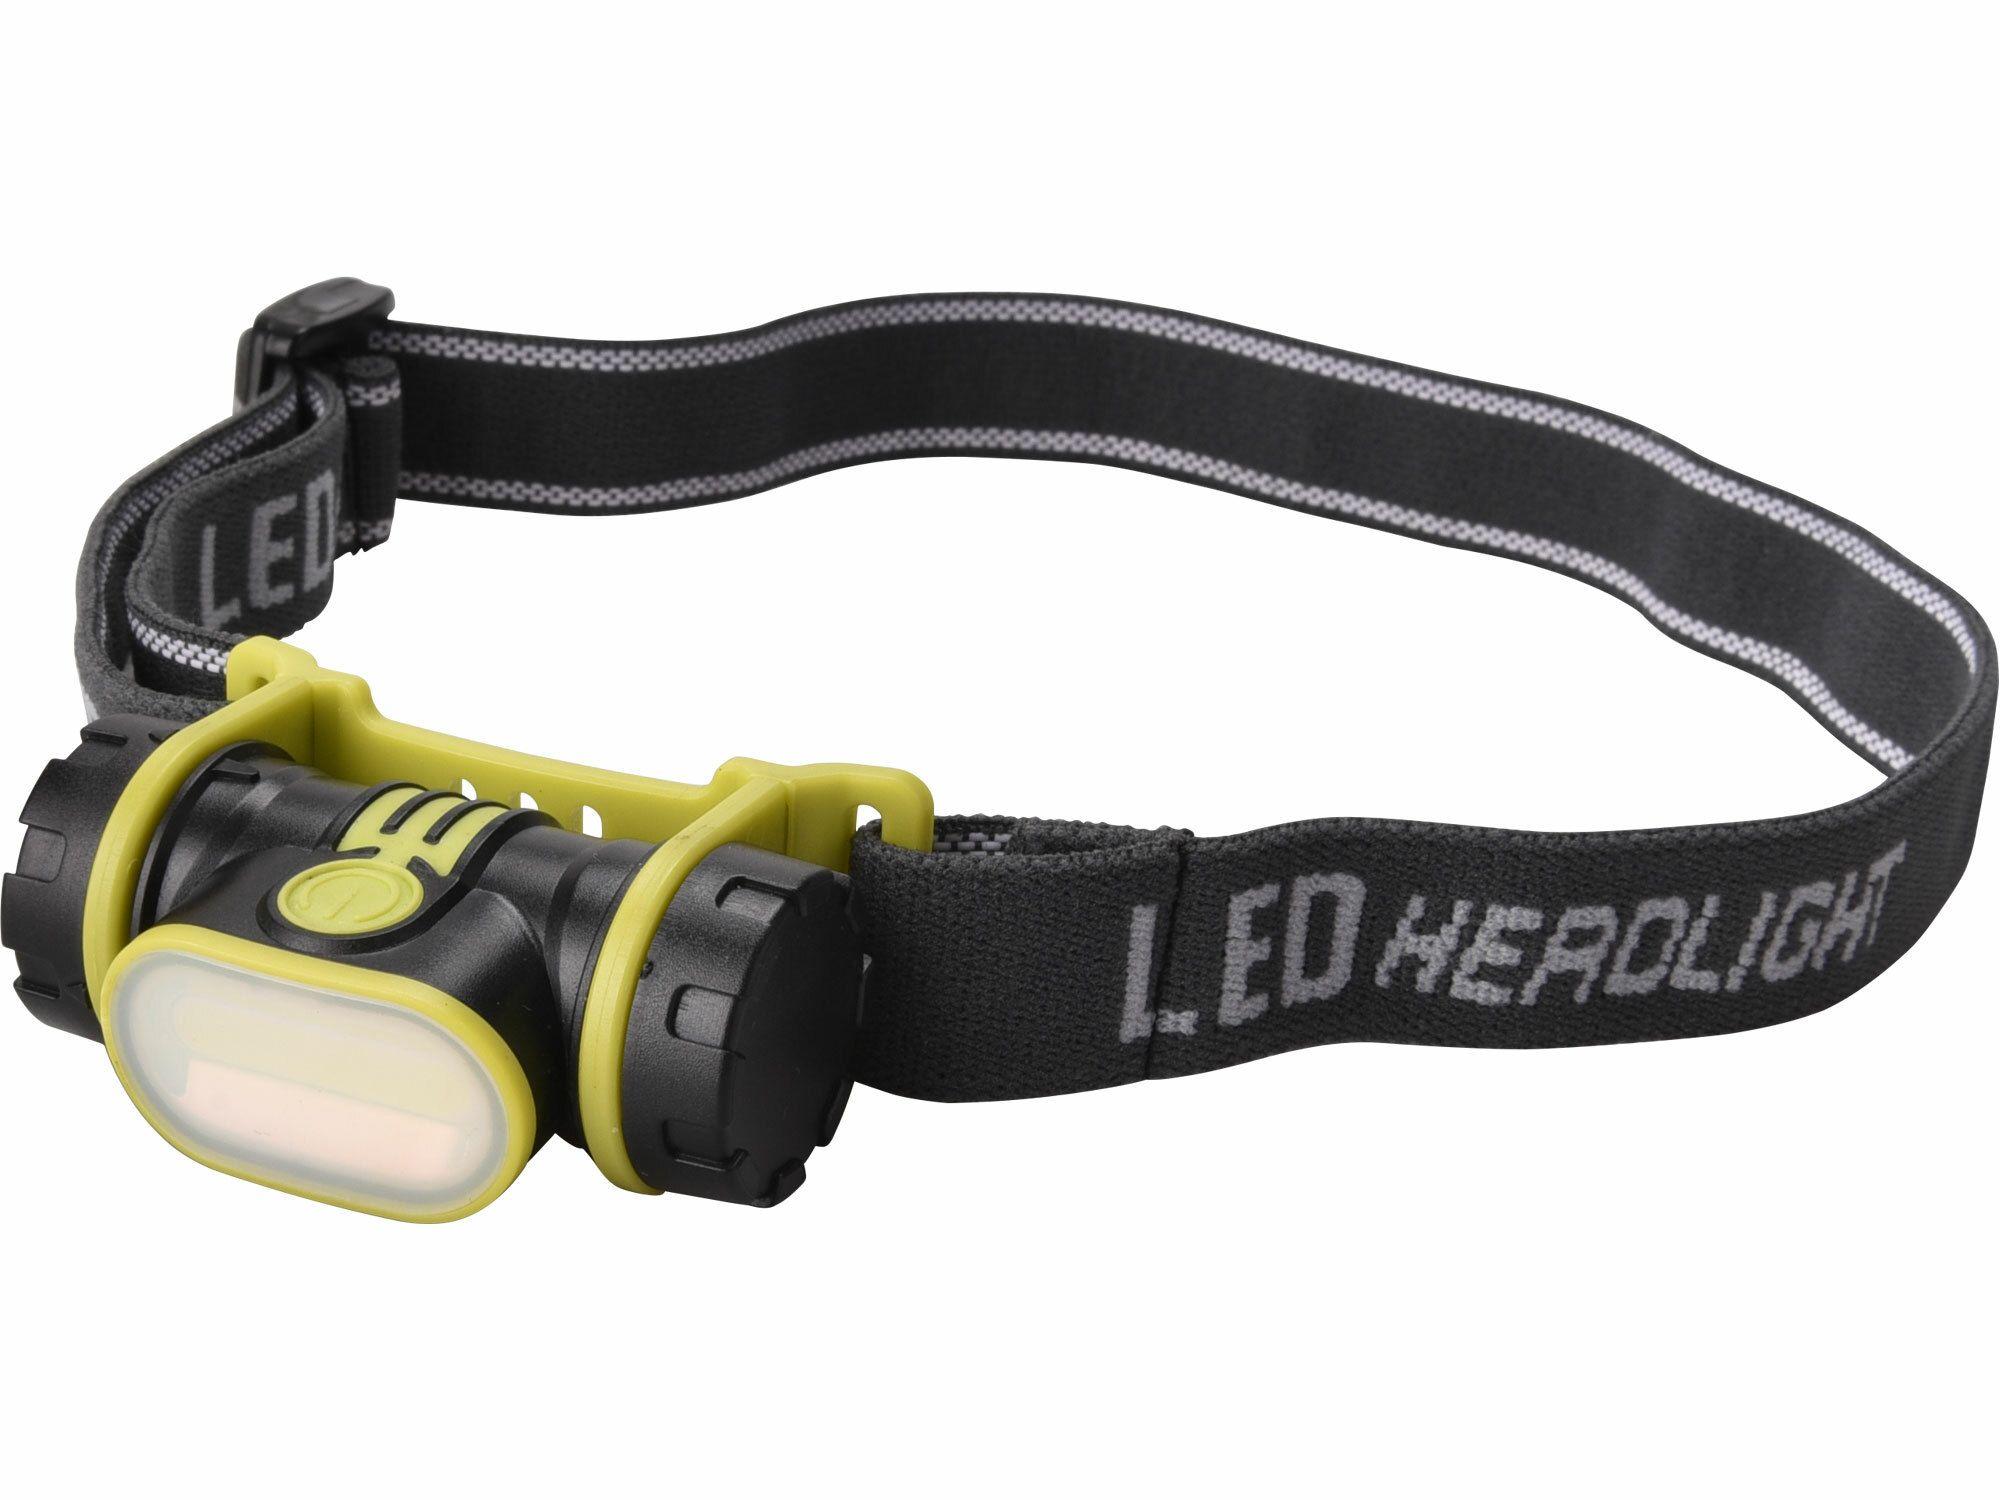 Čelovka širokoúhlá 90lm COB, 2W COB LED, EXTOL LIGHT 43106